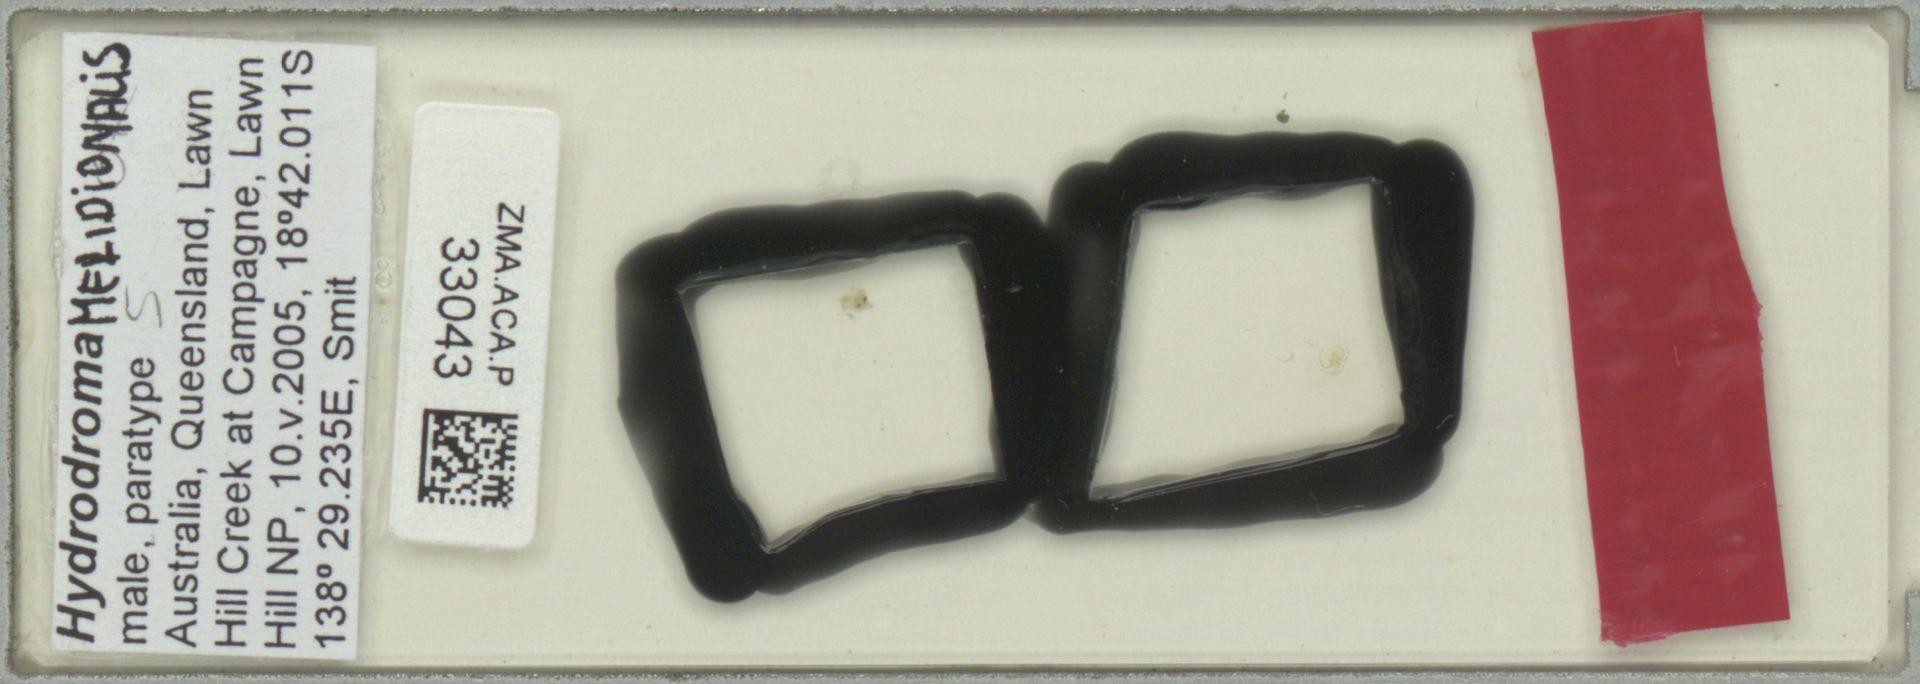 ZMA.ACA.P.33043 | Hydrodroma meridionalis Pesic & Smit, 2011